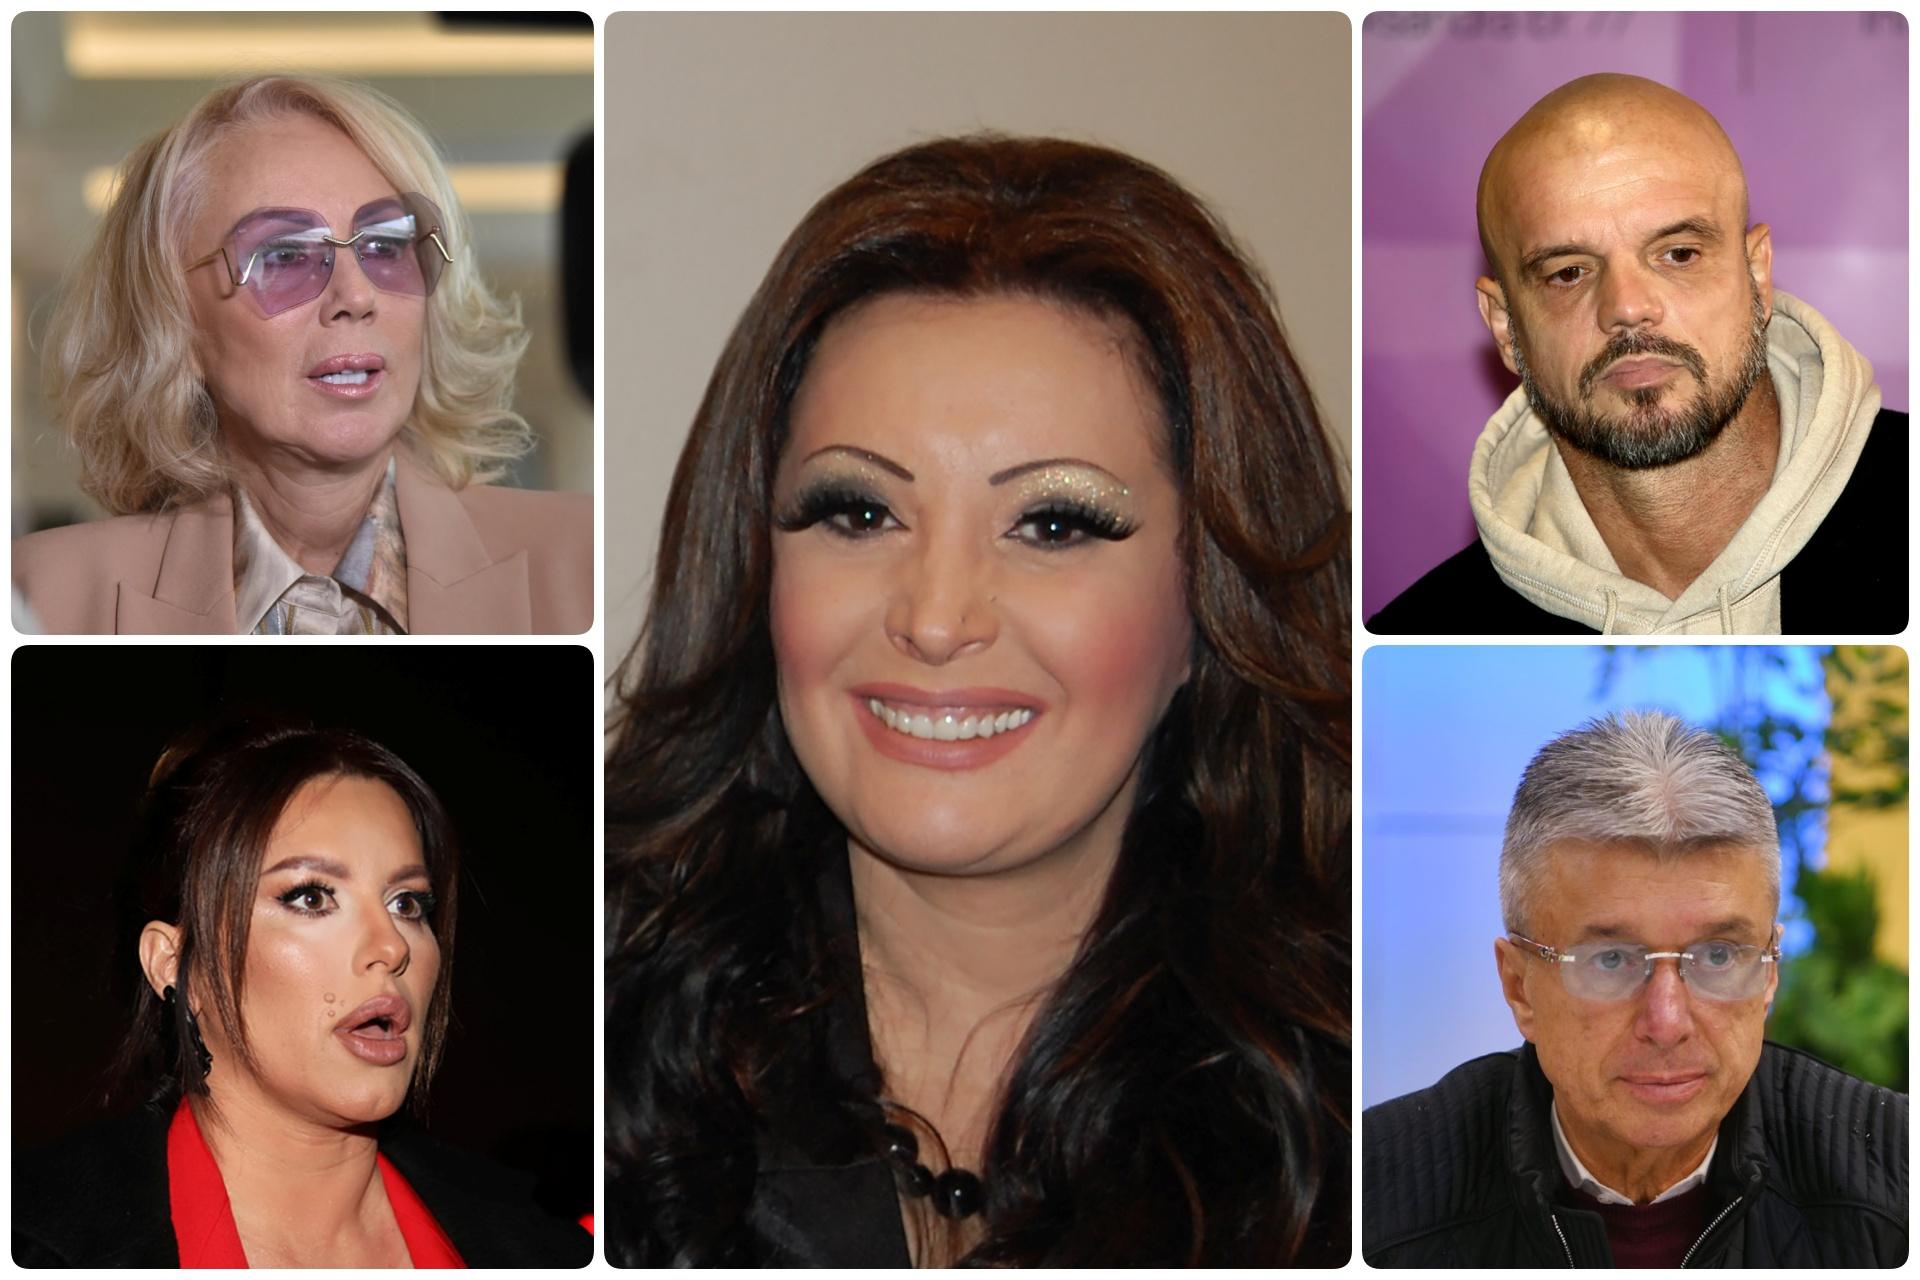 KOMBO Dragana Mirković, Seka Aleksic, Boban Rajovic, Lepa Brena, Sasa Popovic